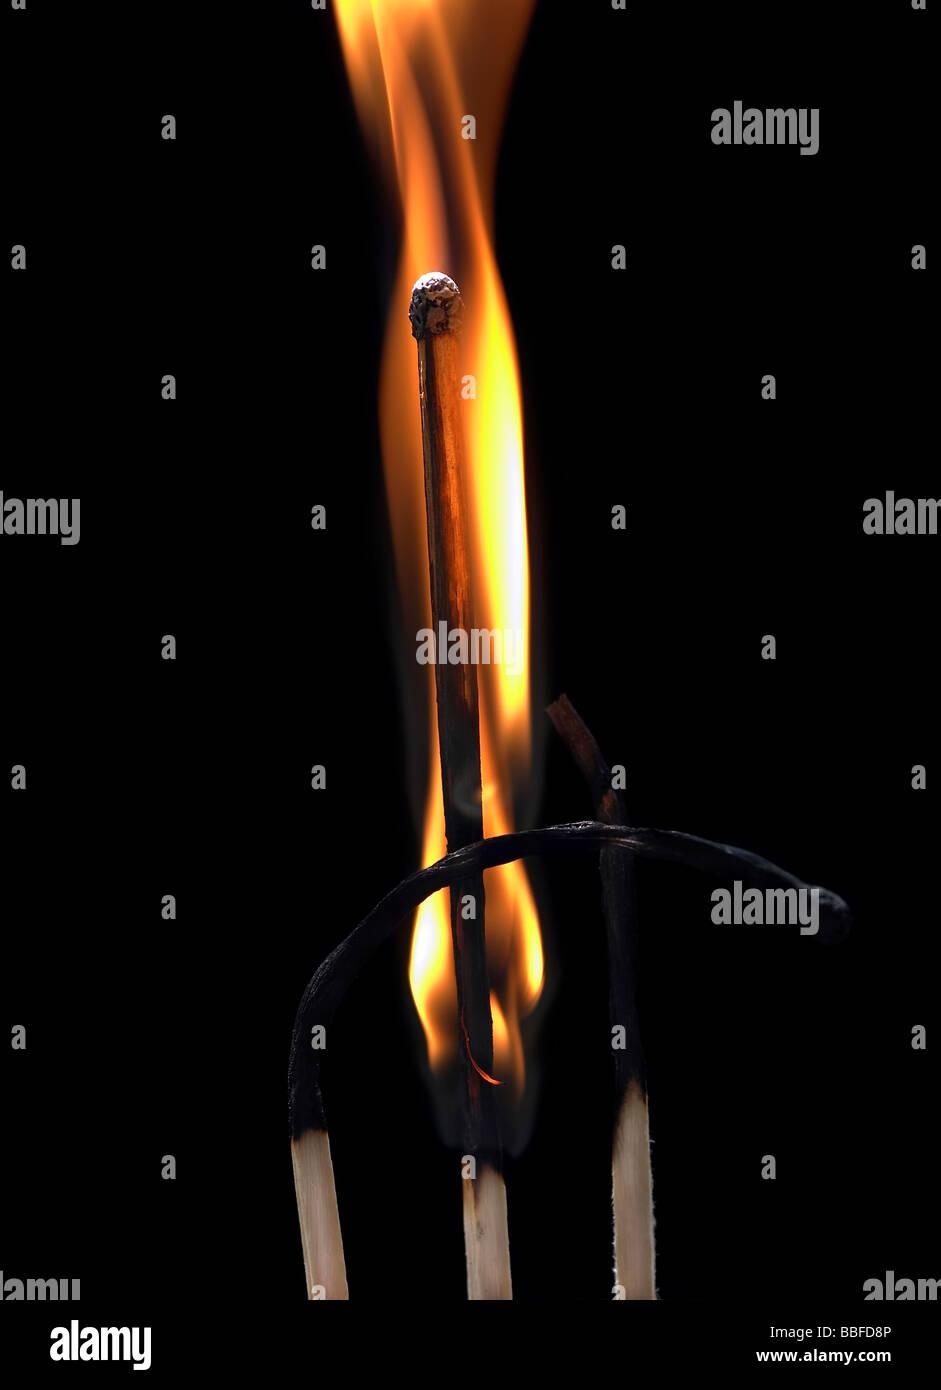 Dettaglio di close-up di partite di Fiery Immagini Stock